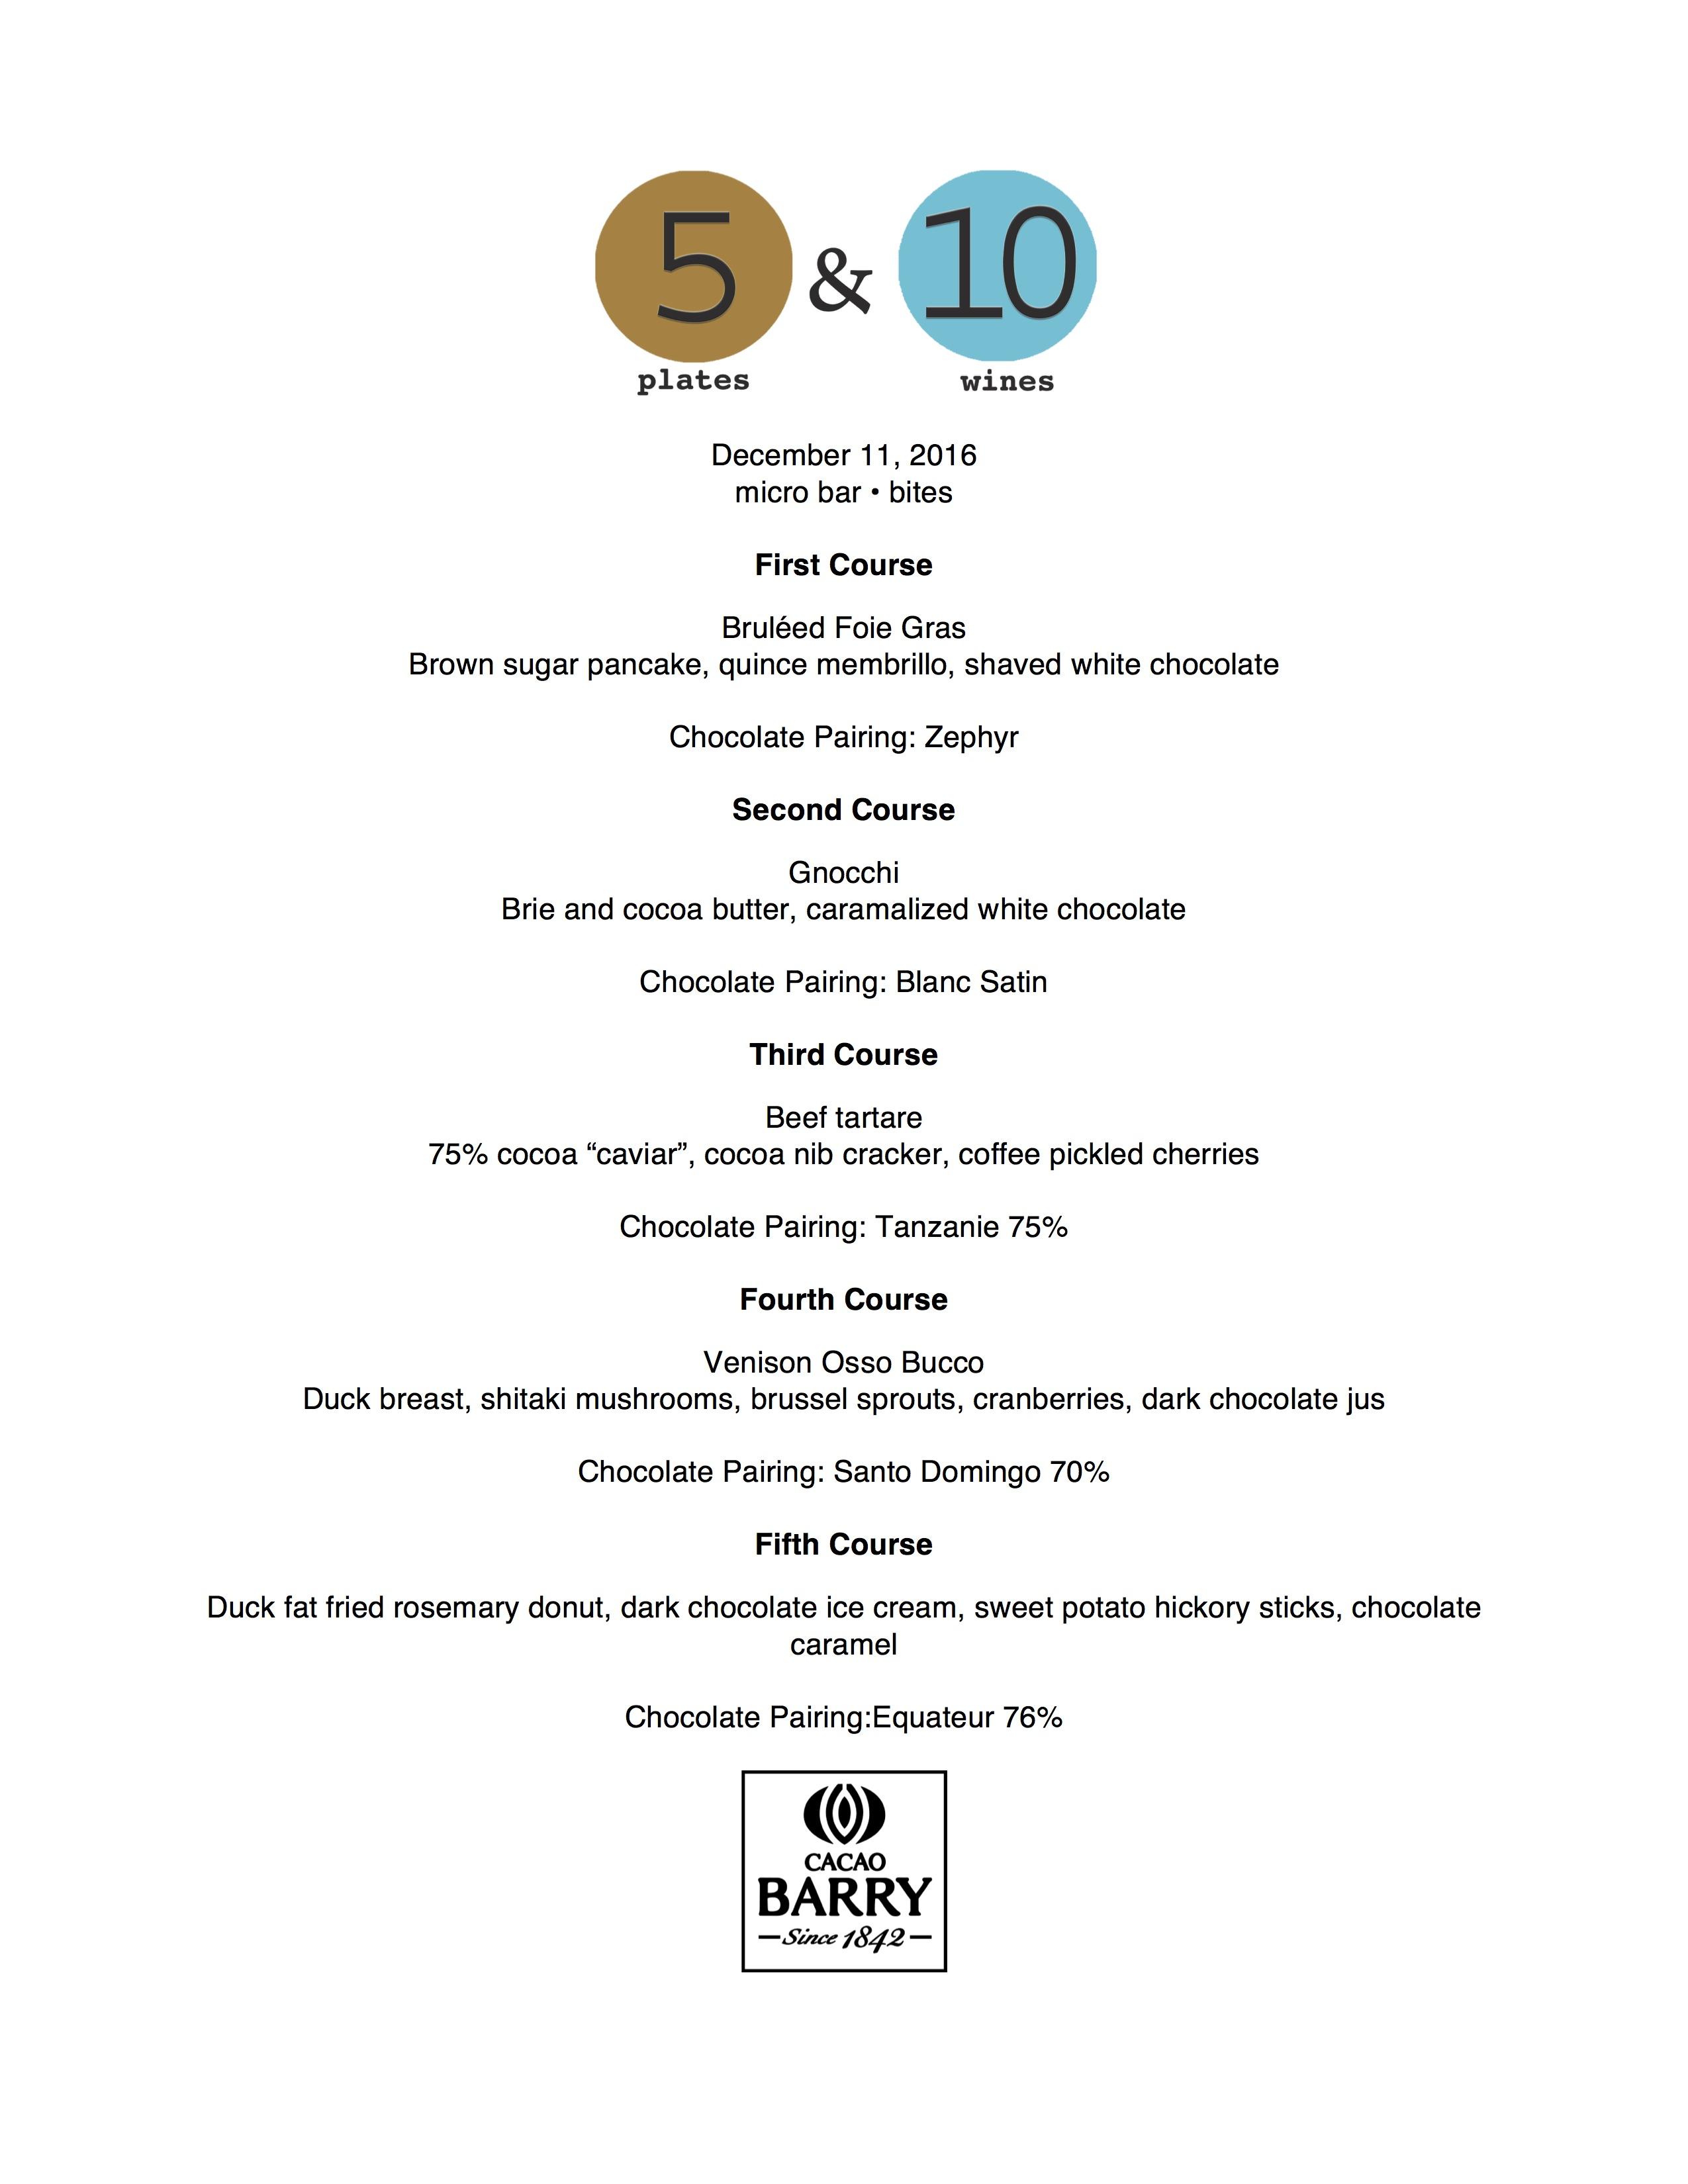 5 Plates menu for December 11, 2016